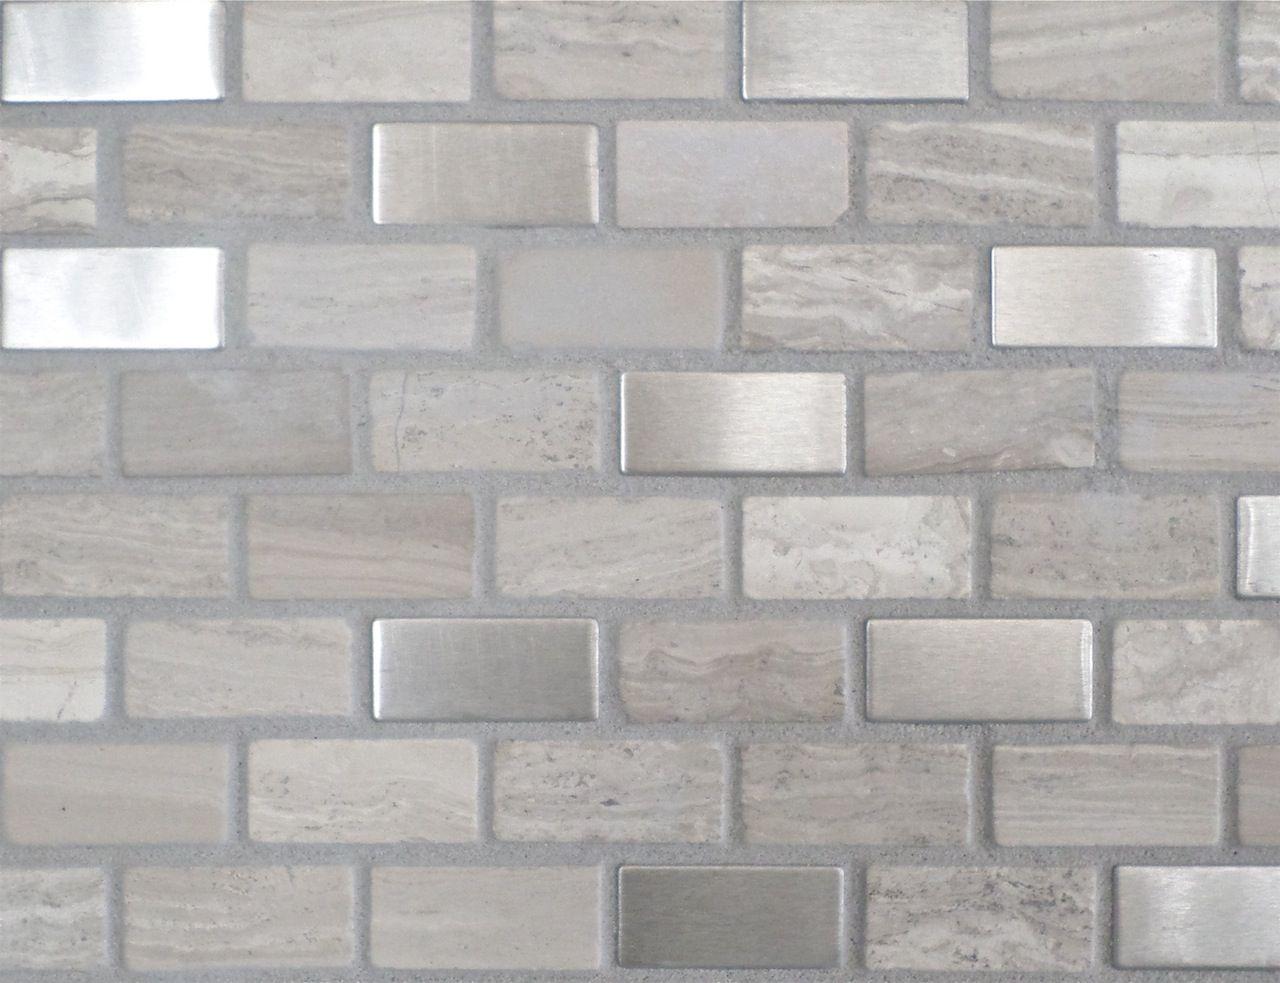 Super Simple Diy Tile Backsplash Tutorial Kitchen Wall Tiles Modern Diy Tile Backsplash